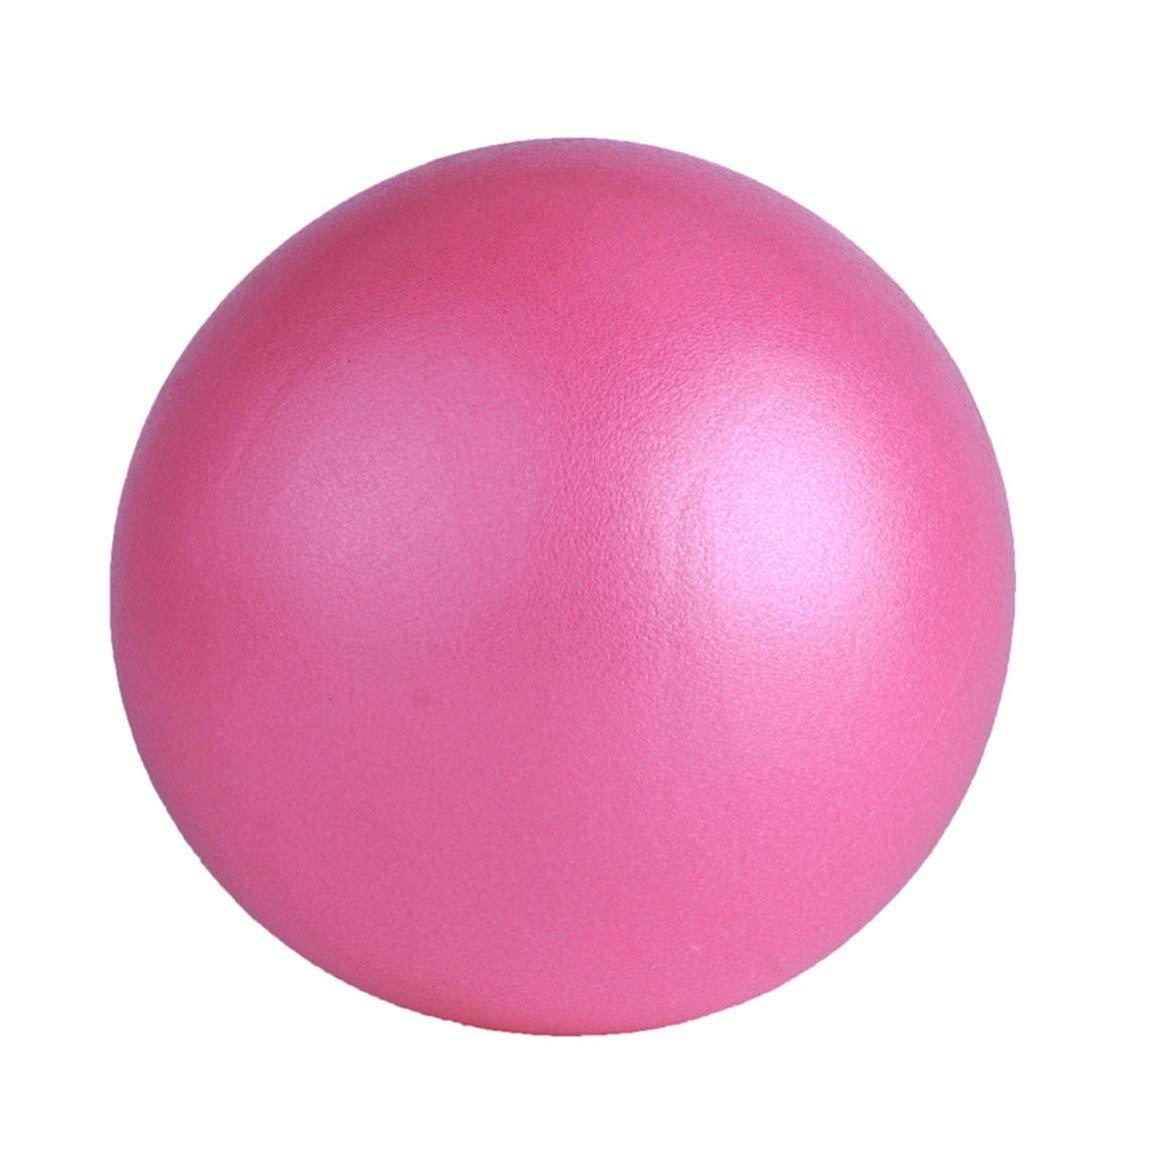 Color: Rosa Pelota de Yoga Bola de Prueba de Fitball para el Ejercicio en casa Deporte Bola de Ejercicio Profesional Antideslizante 73JohnPol Pelota de Yoga de tama/ño peque/ño Equilibrio